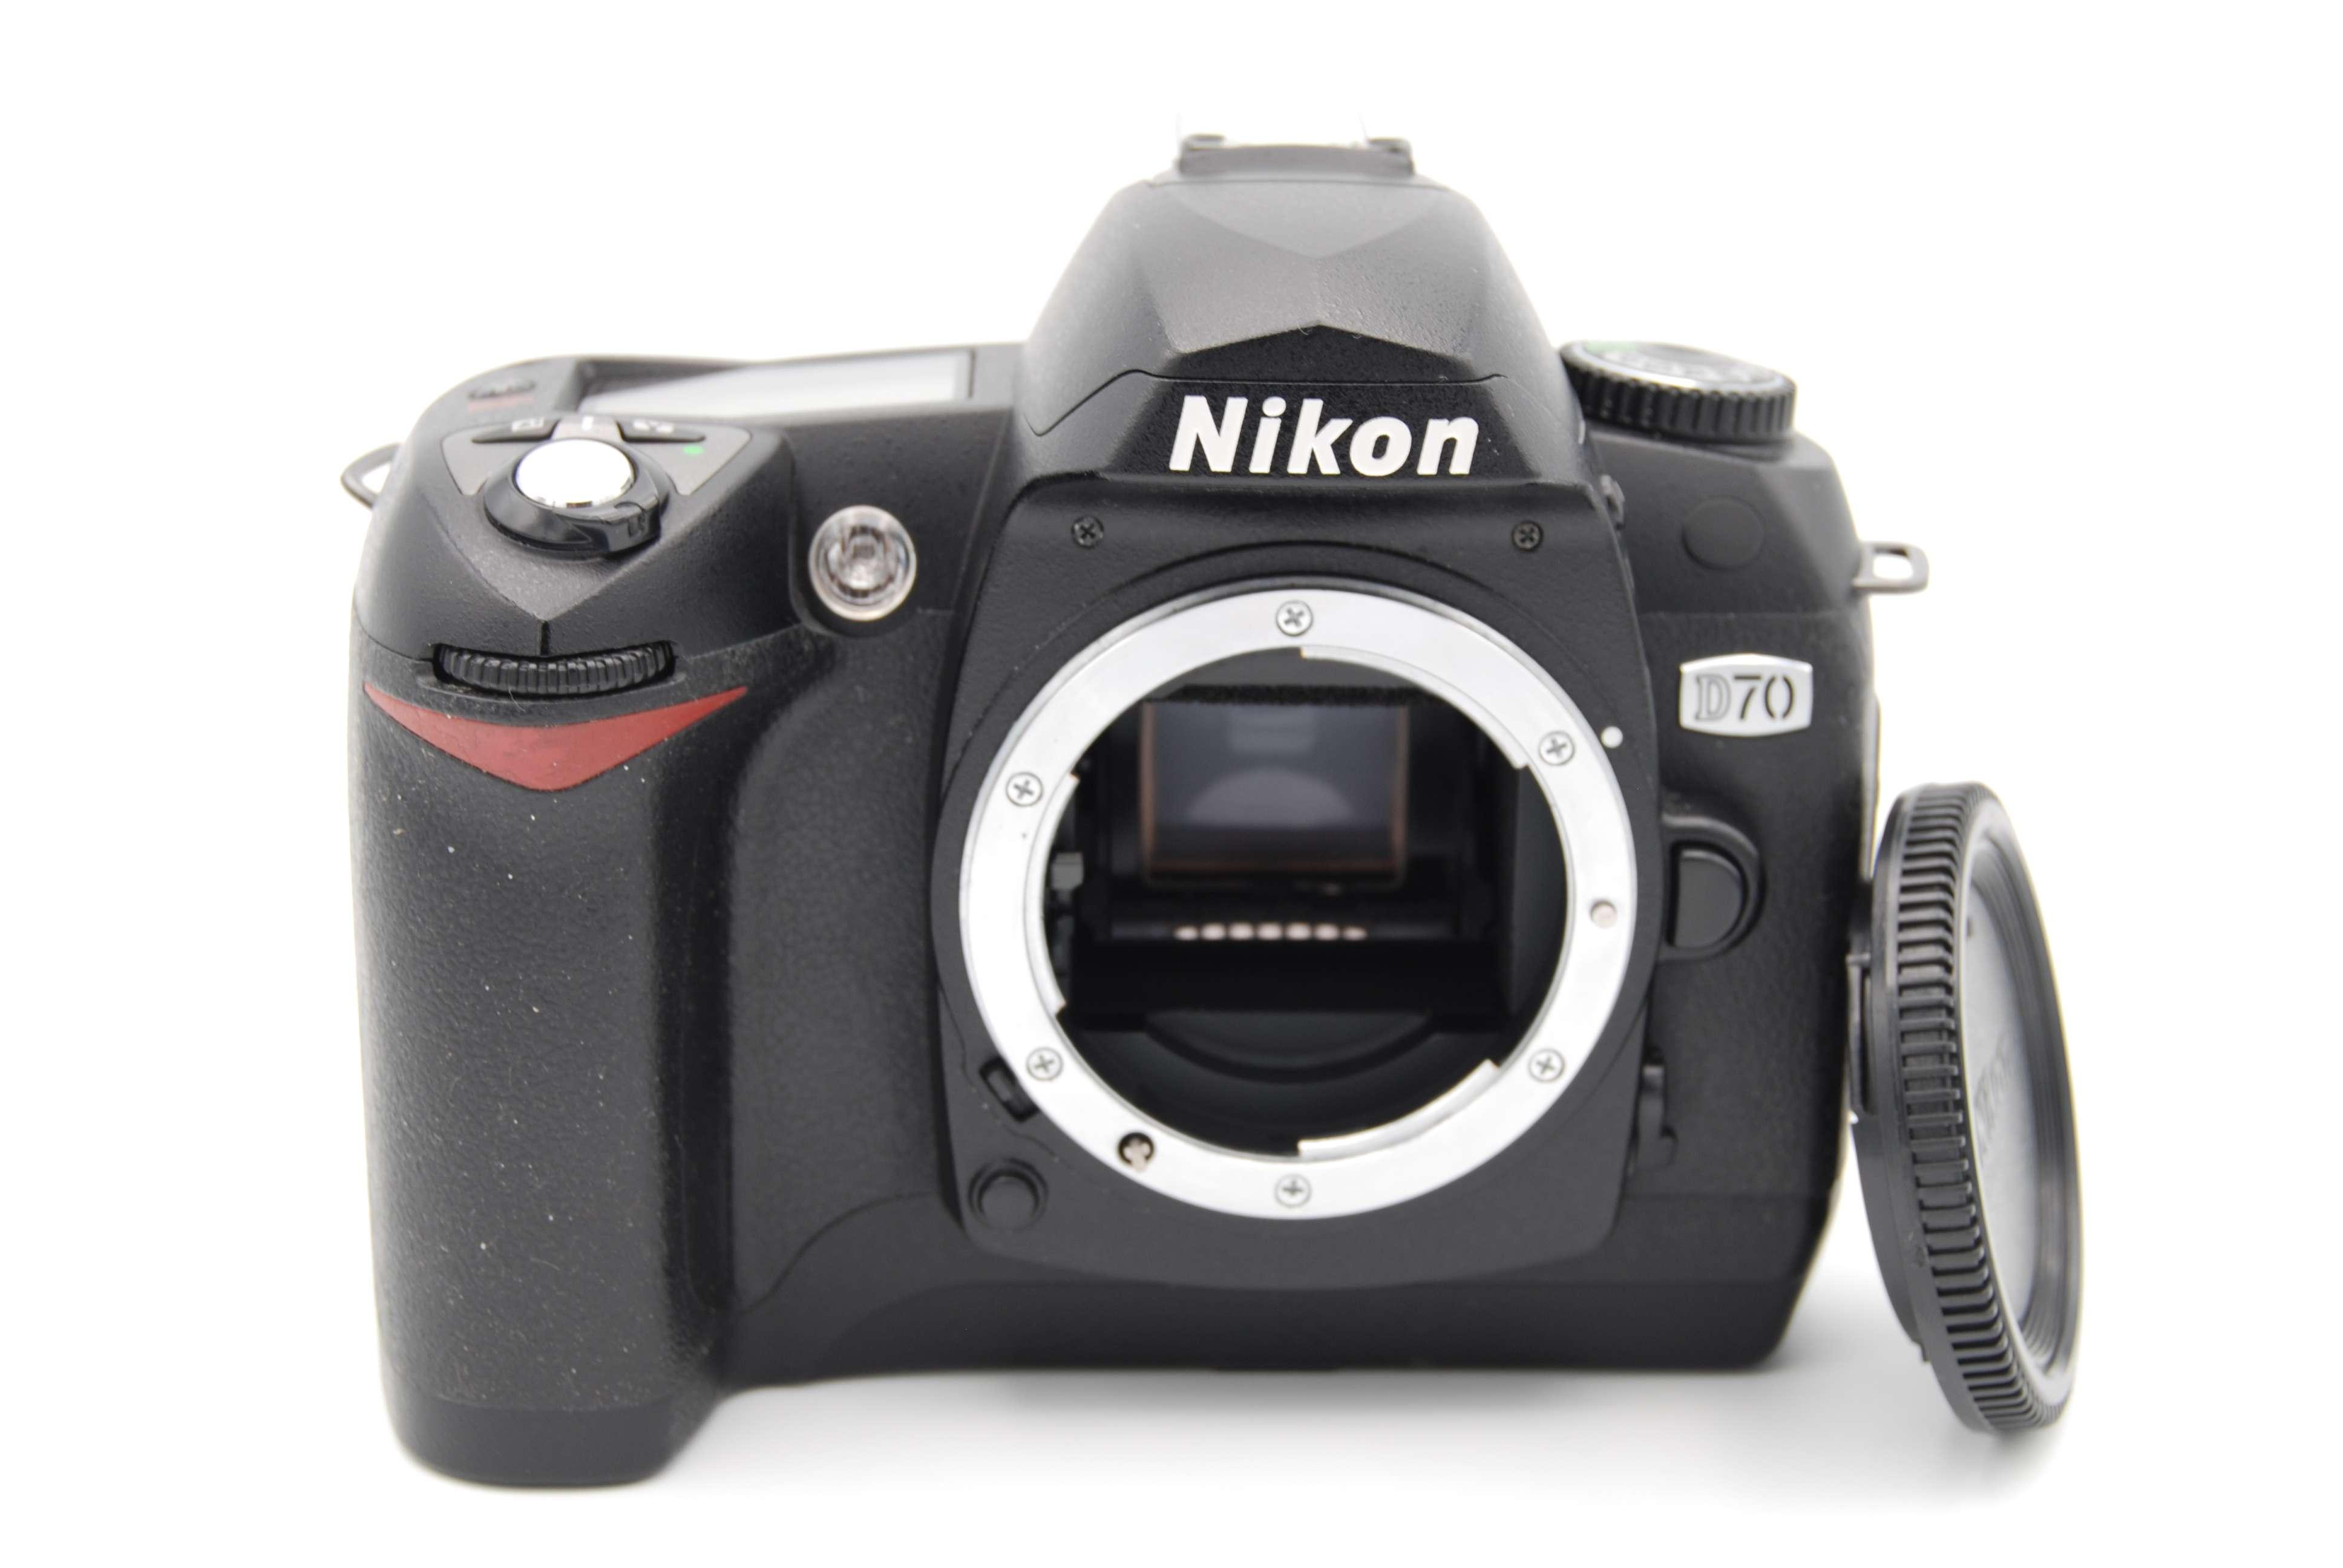 nikon d70 6 1mp 1 8 u2033 screen digital slr camera body only shutter rh ebay com Nikon D70 ManualDownload Nikon D70 Manual Online